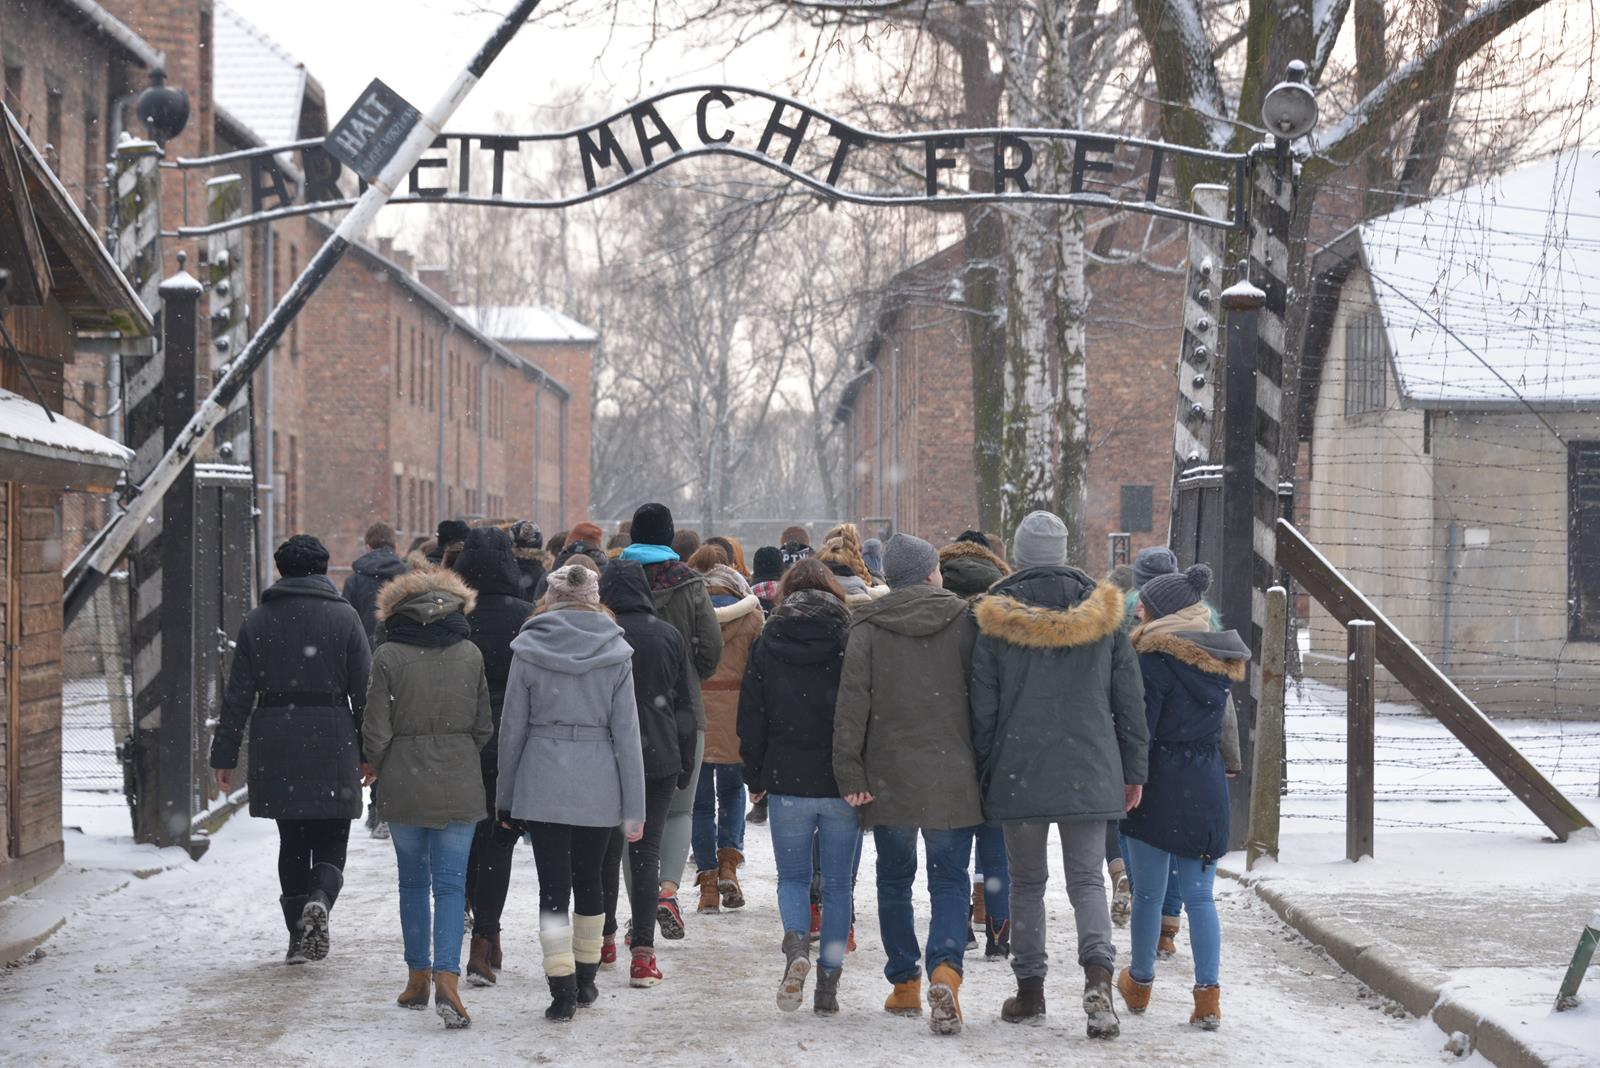 Group of visitors at Auschwitz I - Photo by Pawel Sawicki © Auschwitz-Birkenau State Museum - Musealia.JPG